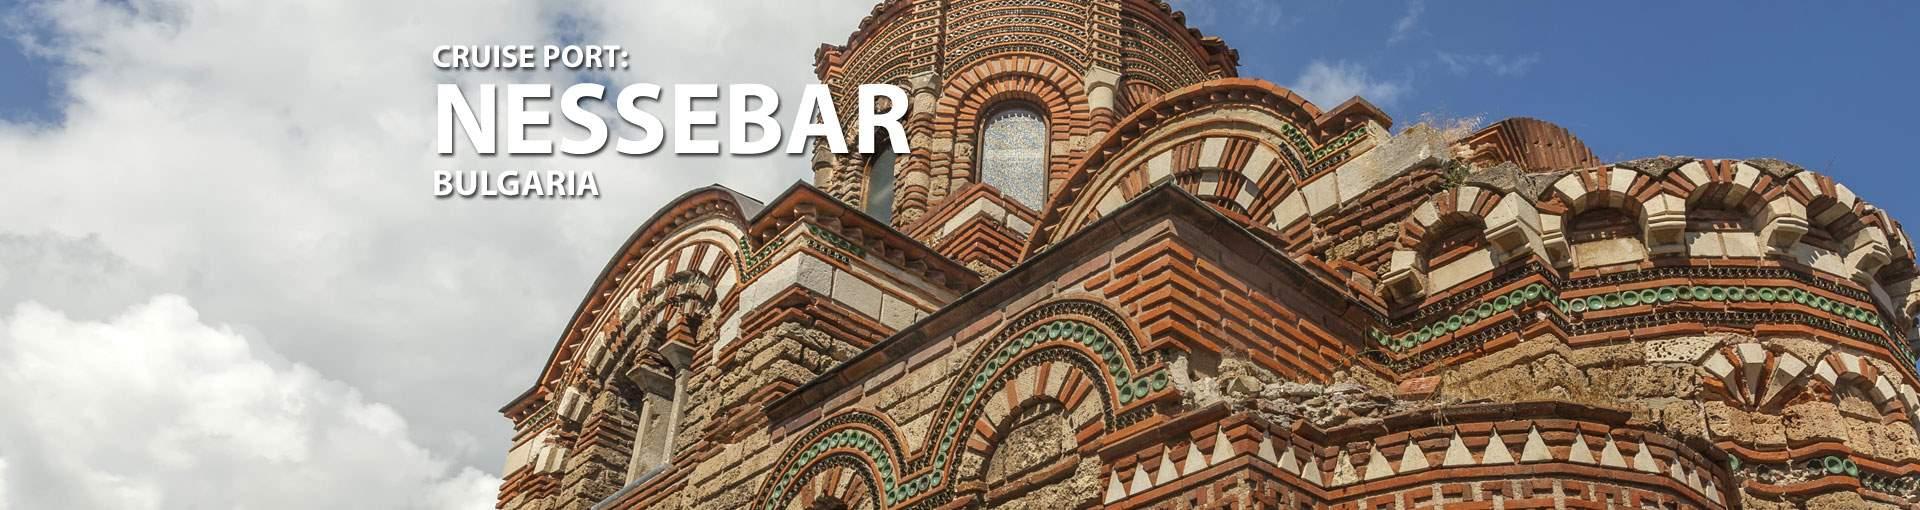 Cruises to Nessebar, Bulgaria